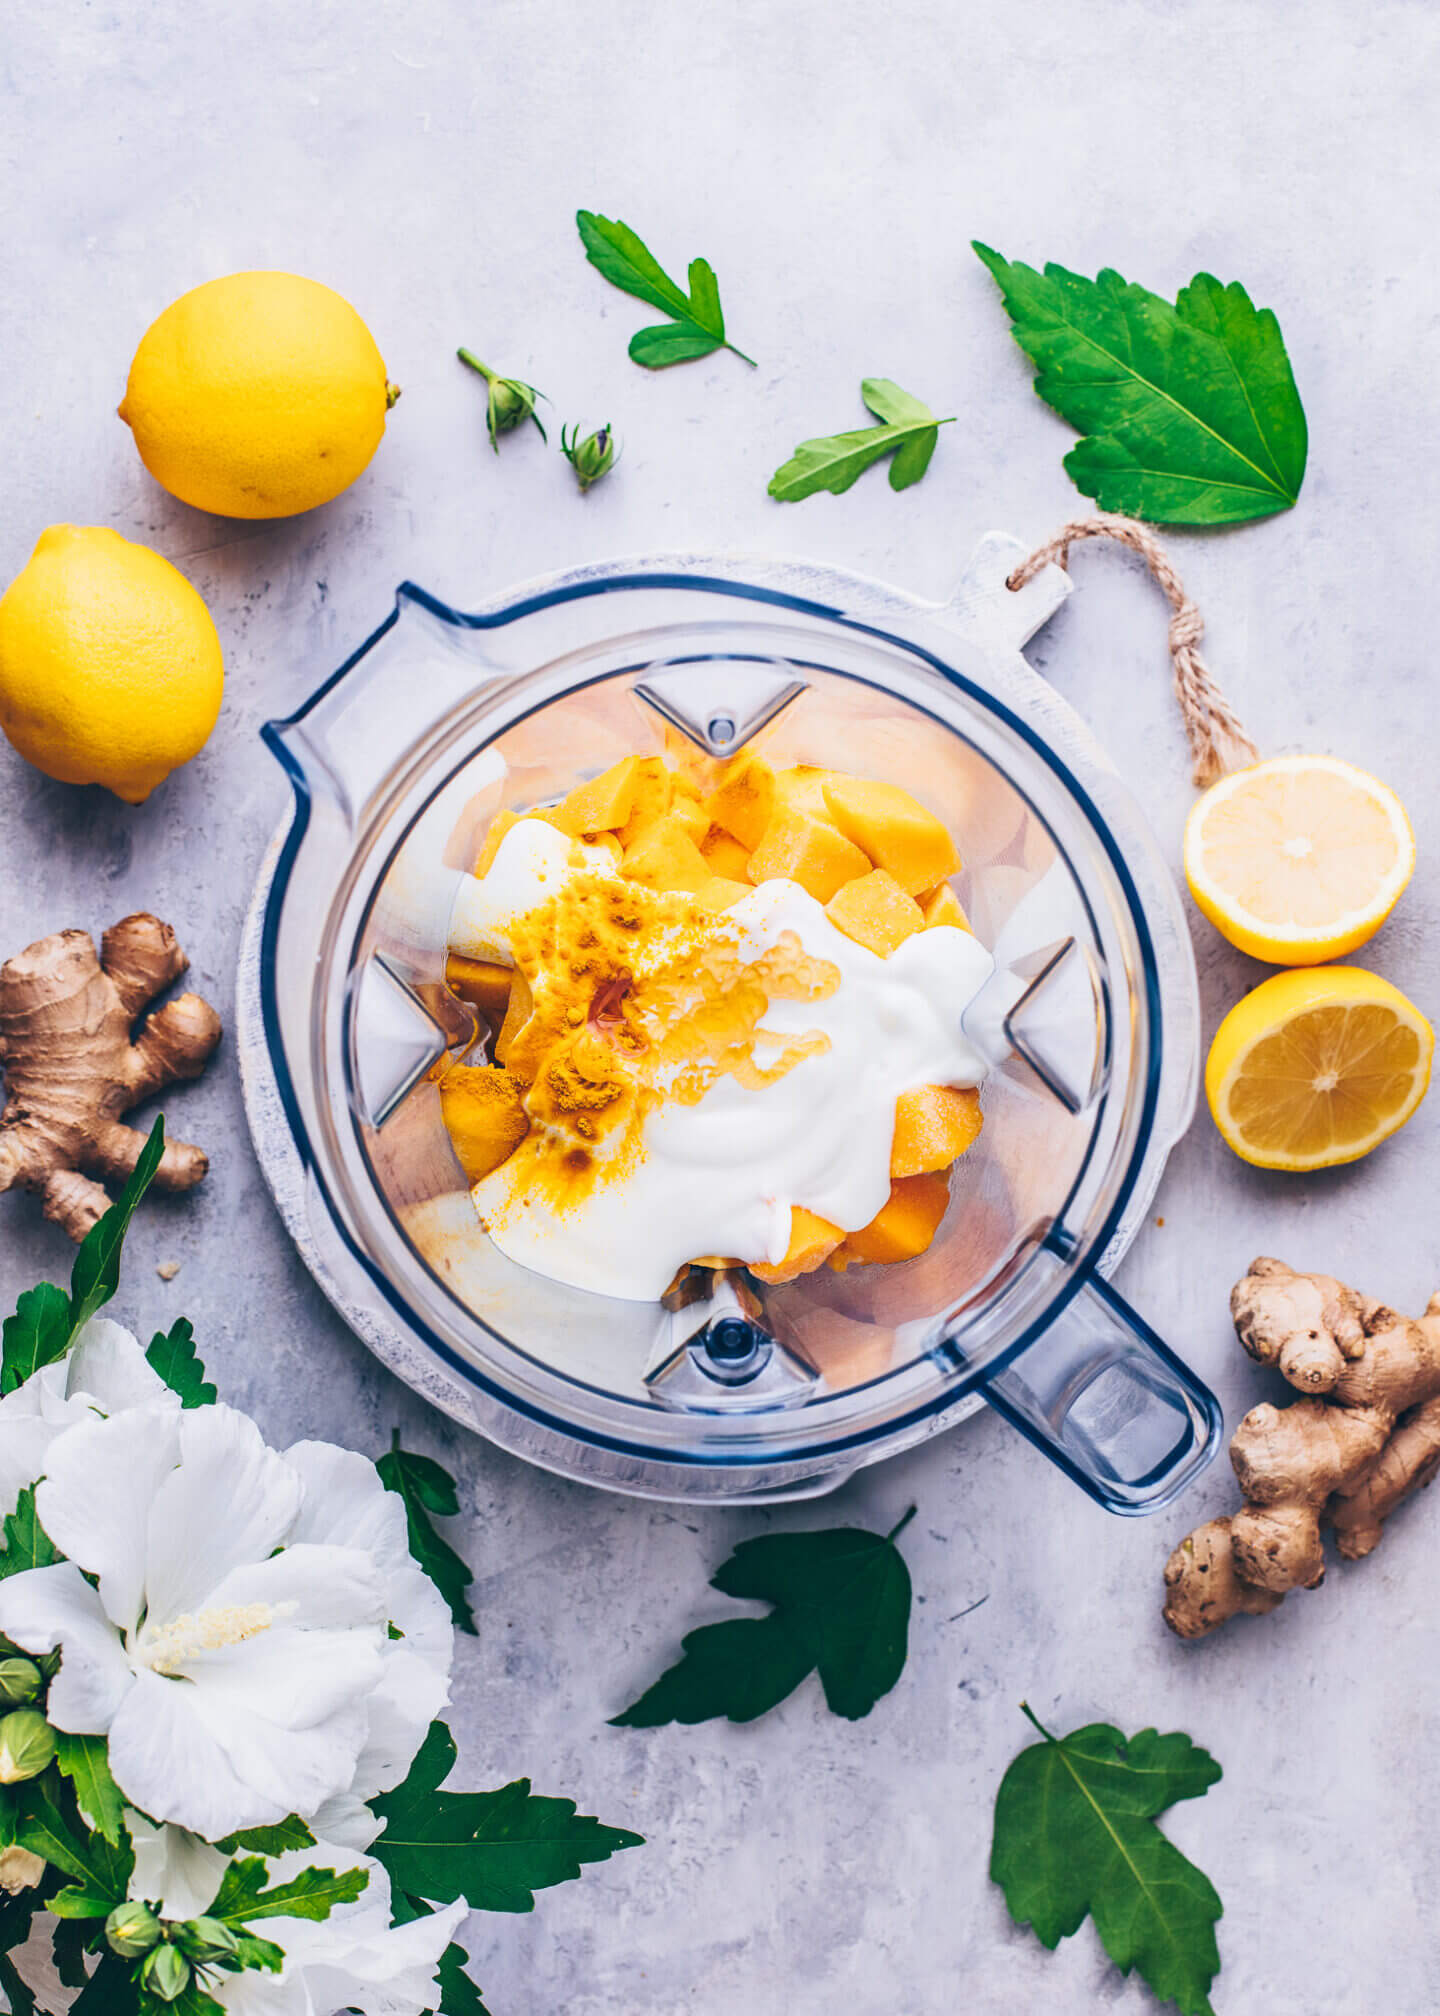 mango, yogurt, ginger, agave syrup, lemons, and turmeric in a blender to make Lassi